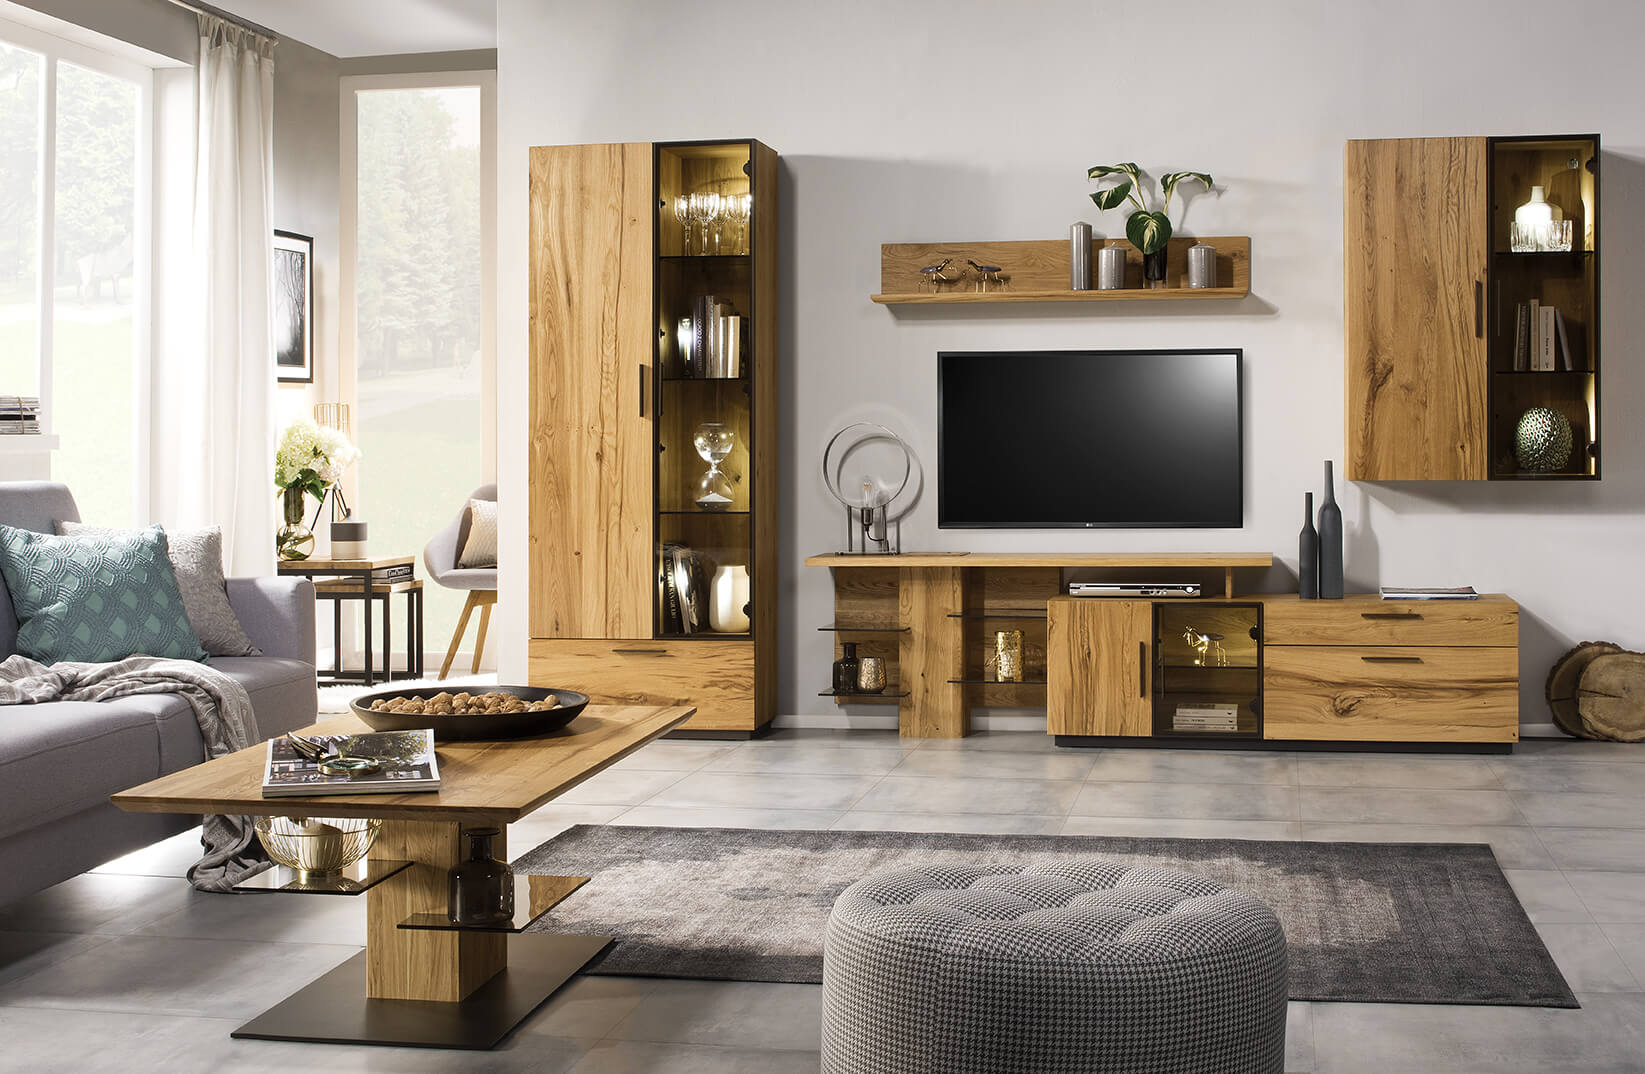 meble-styl-loft-drewno